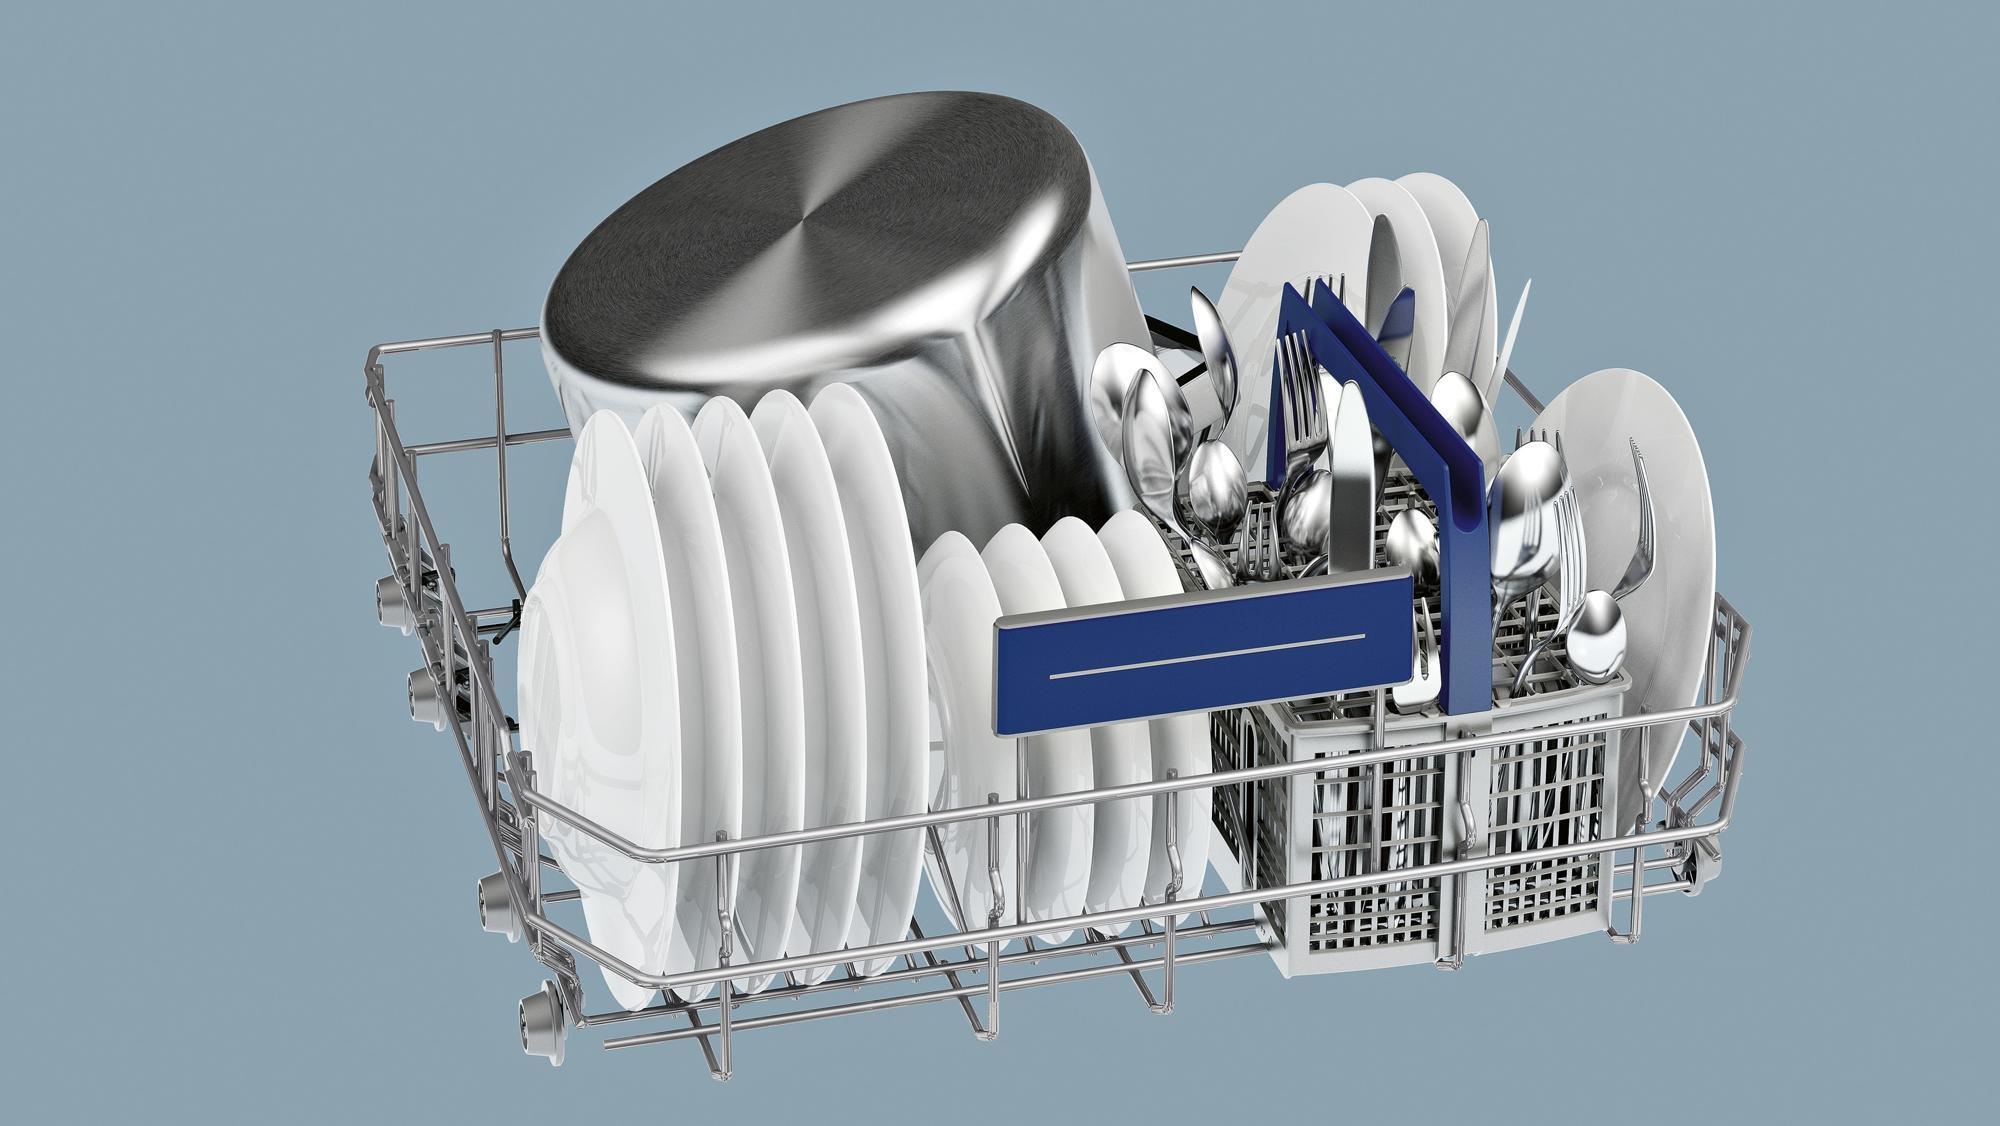 Siemens Kühlschrank 45 Cm Breit : Siemens sn s ie a integrierbarer geschirrspüler cm breit